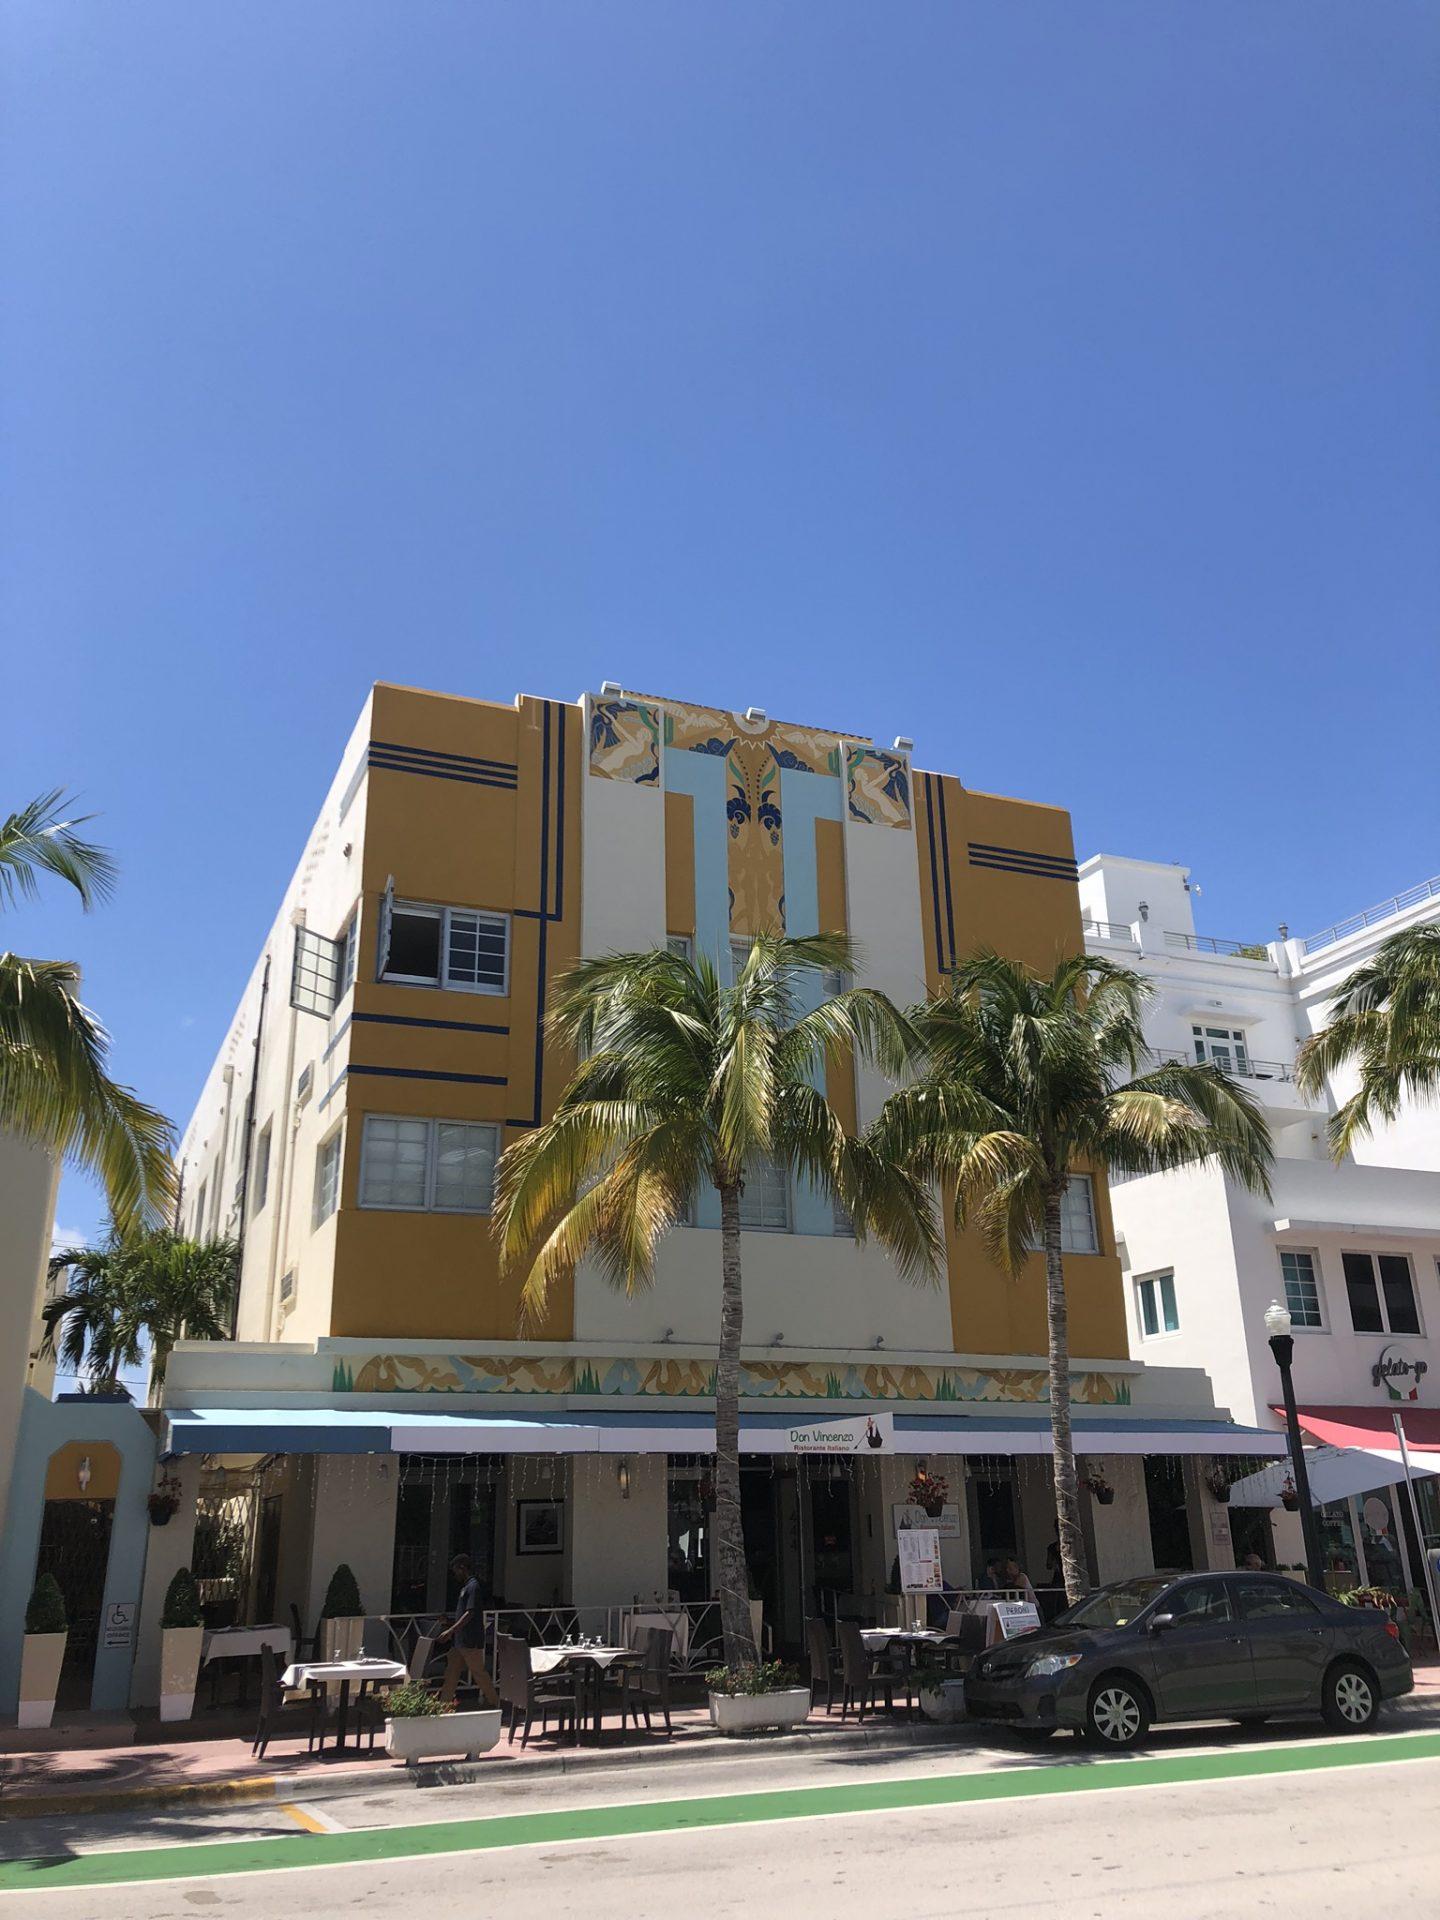 Art deco buildings on Ocean Drive, Florida